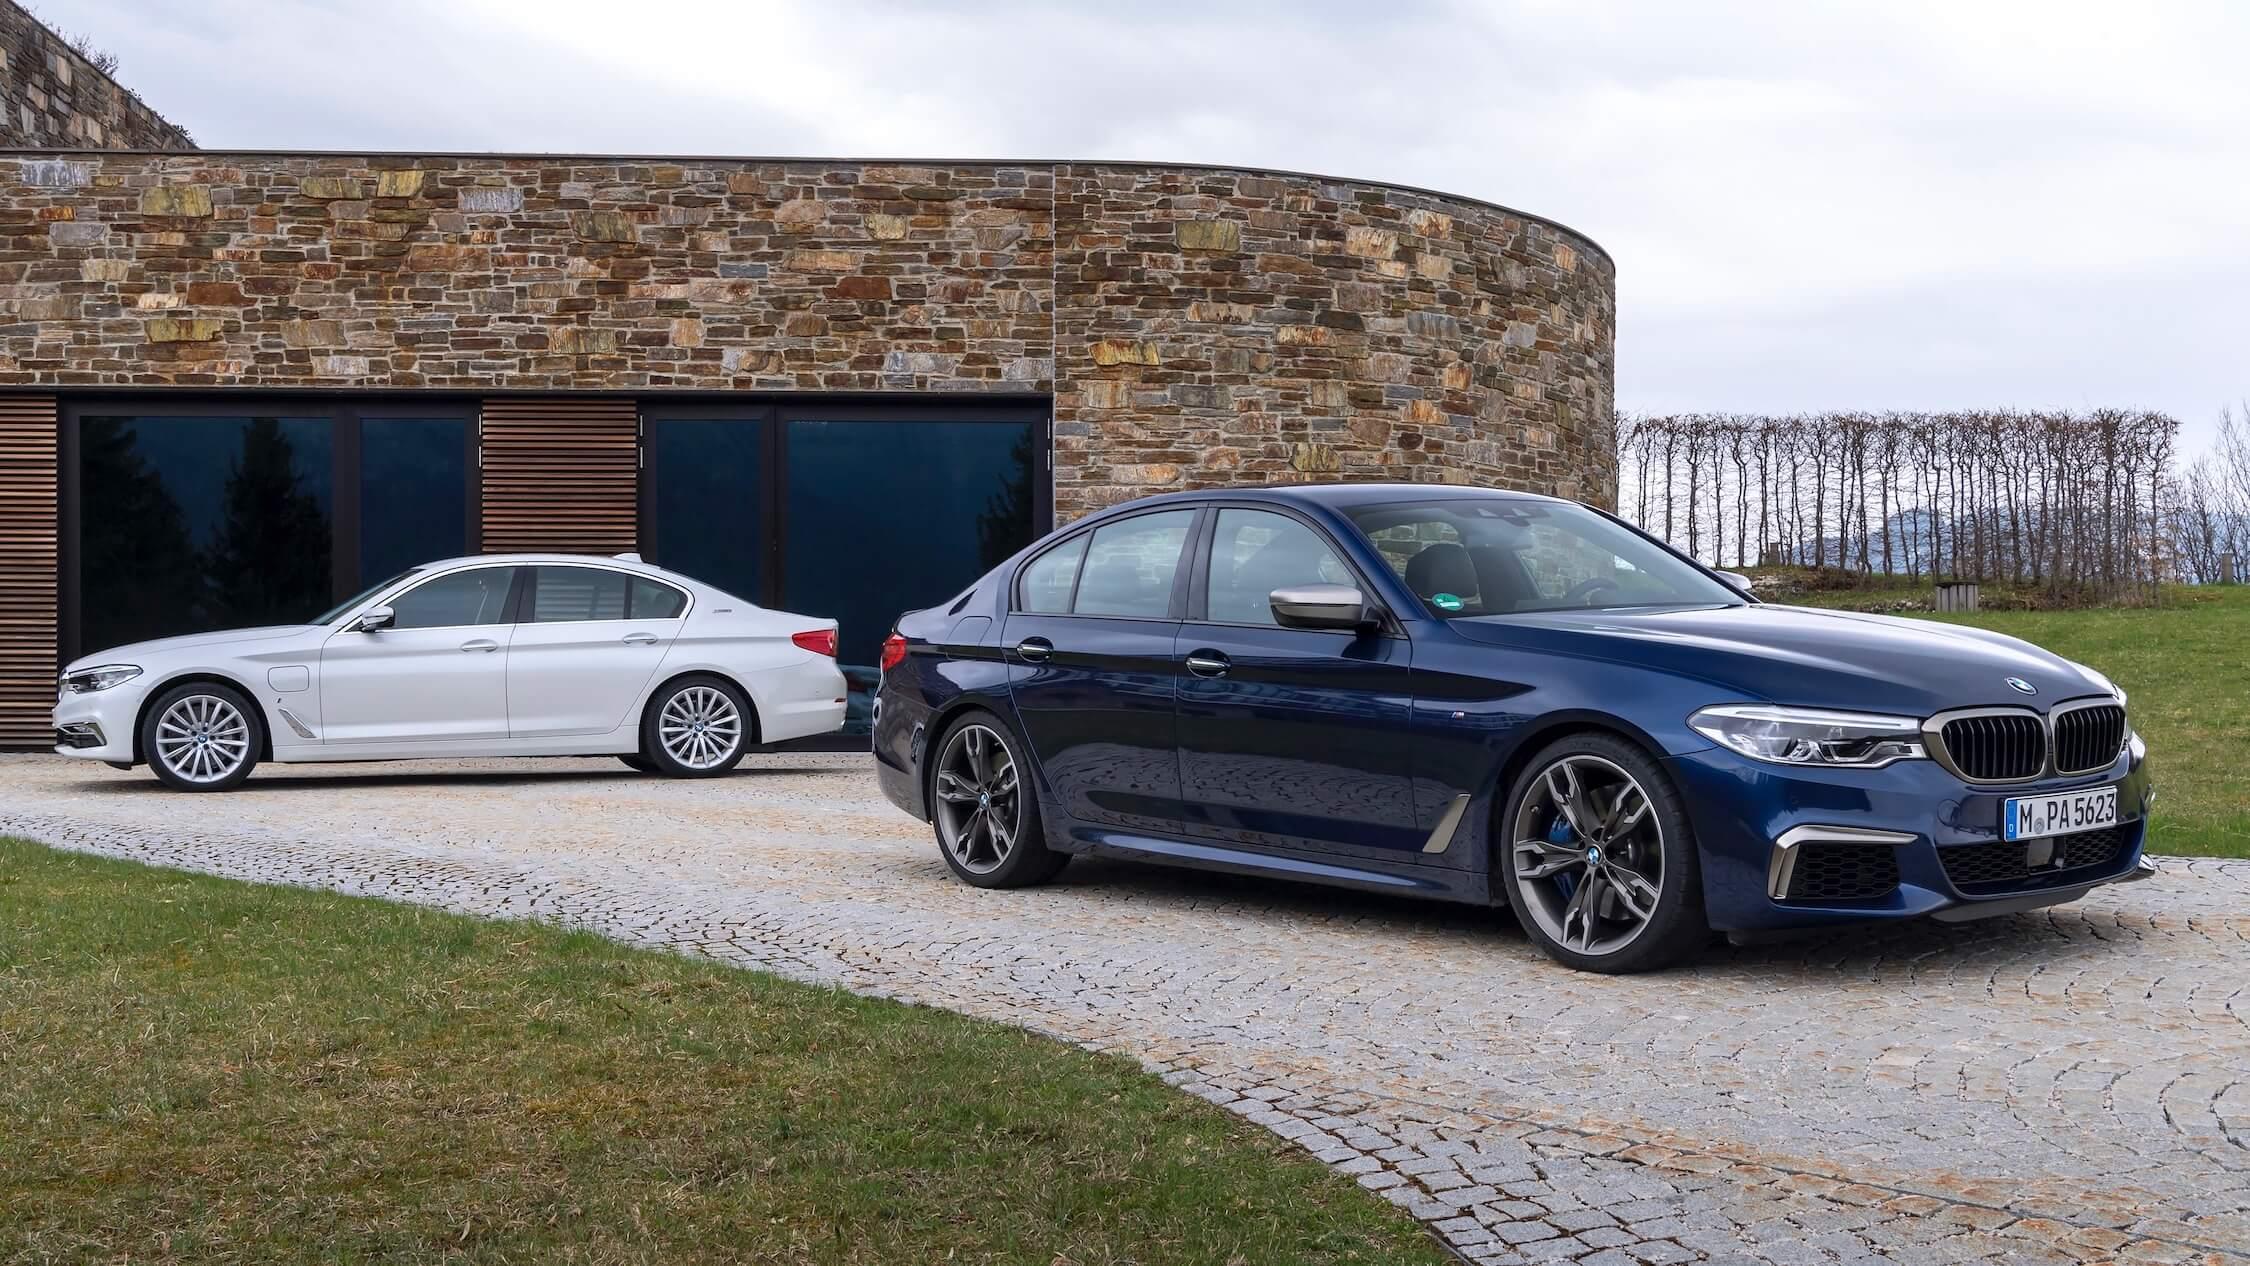 BMW 530e azul e branco